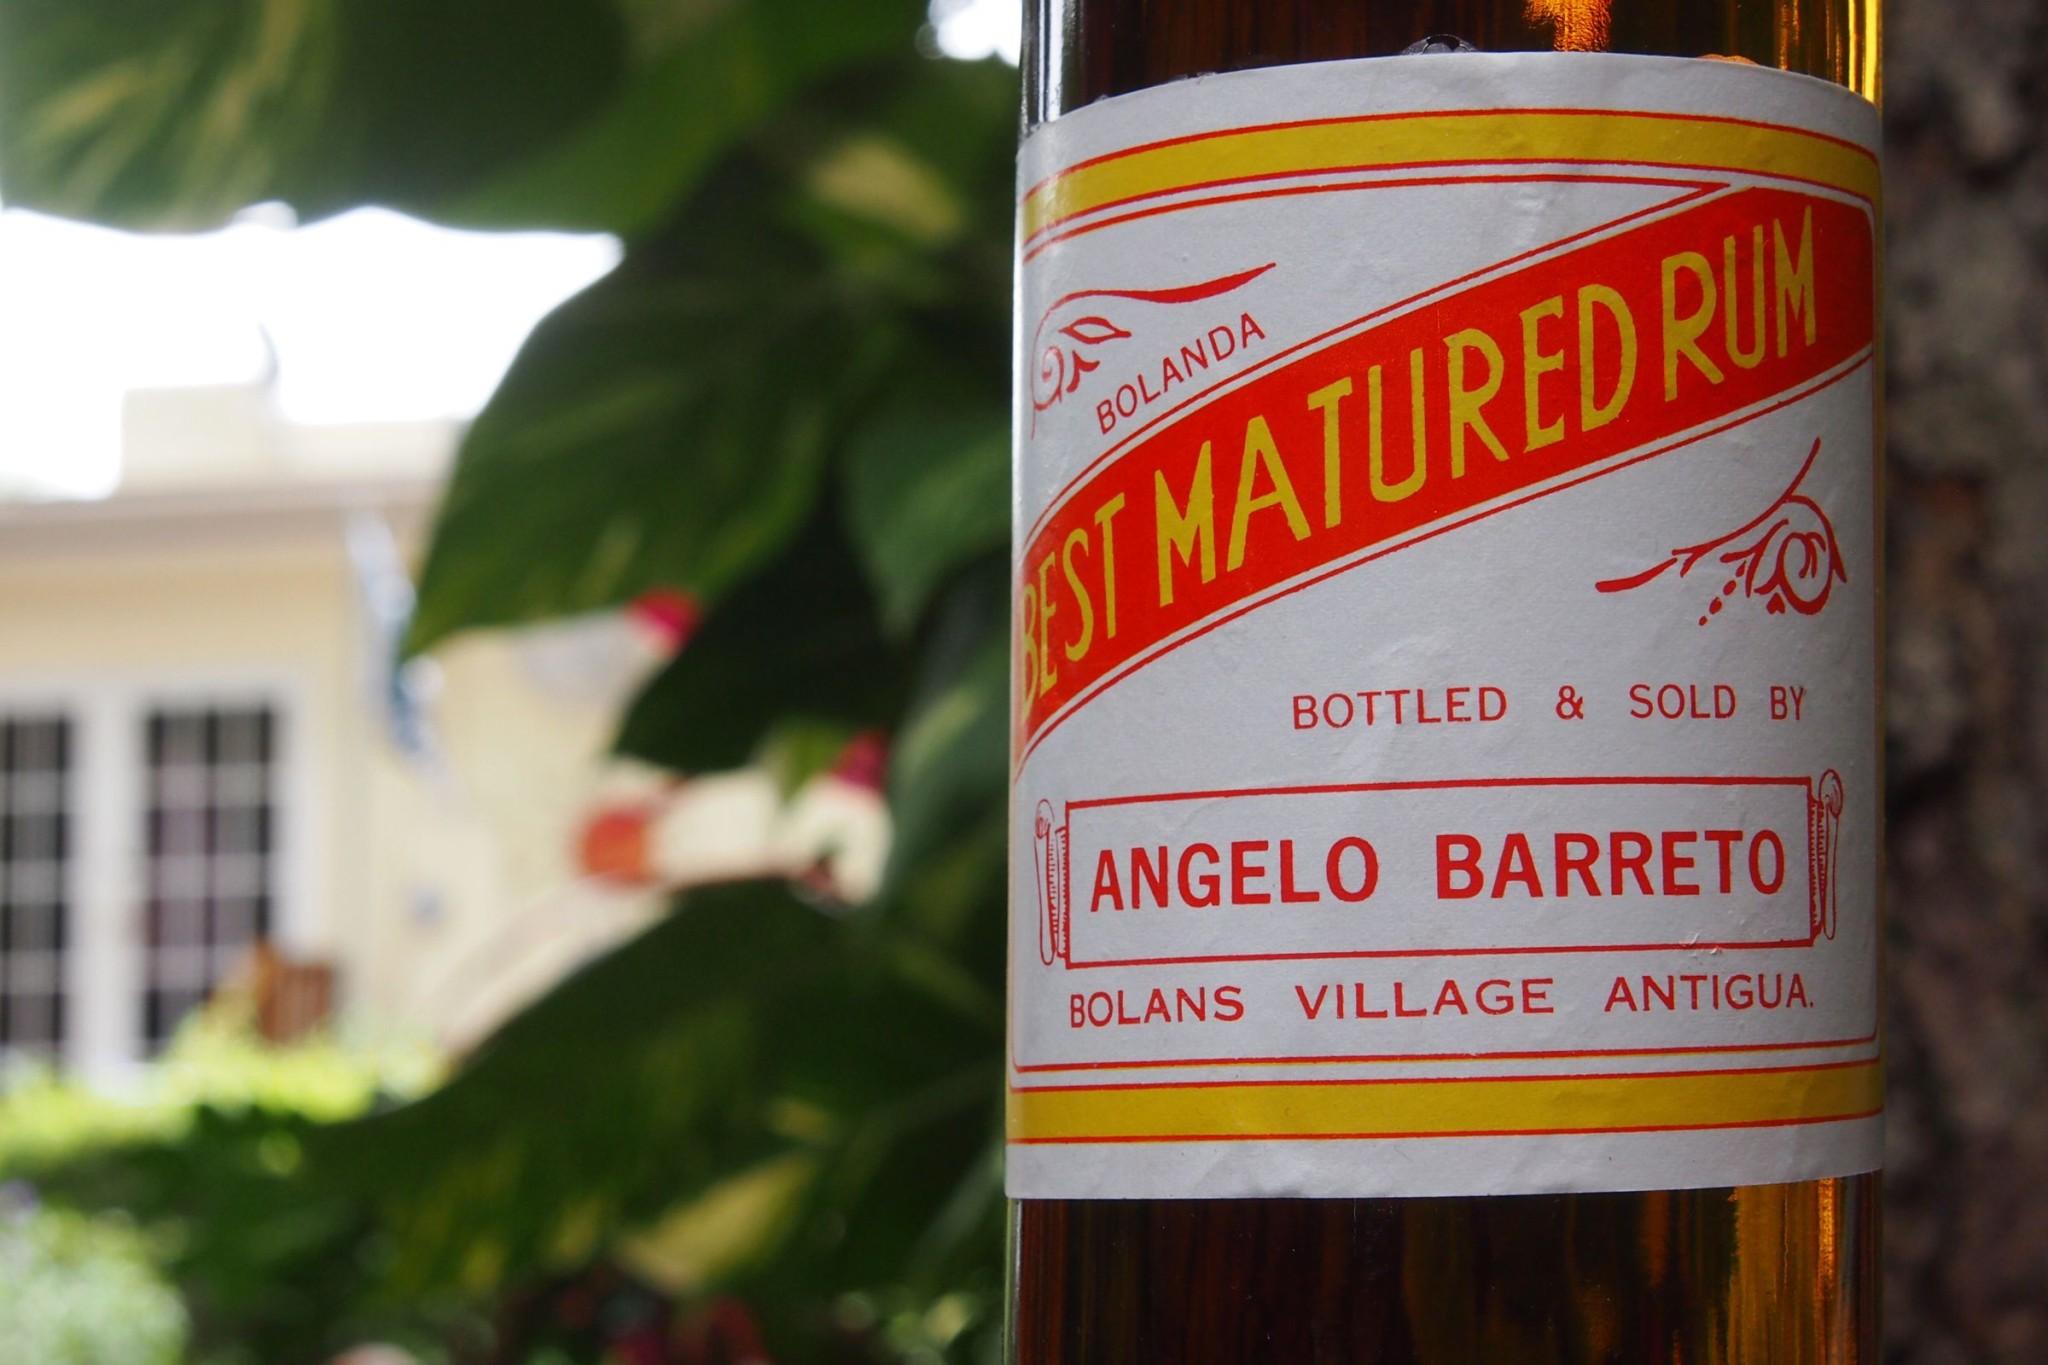 Friday Happy Hour: Bushy's 1 & 9 Best Matured Rum from Antigua